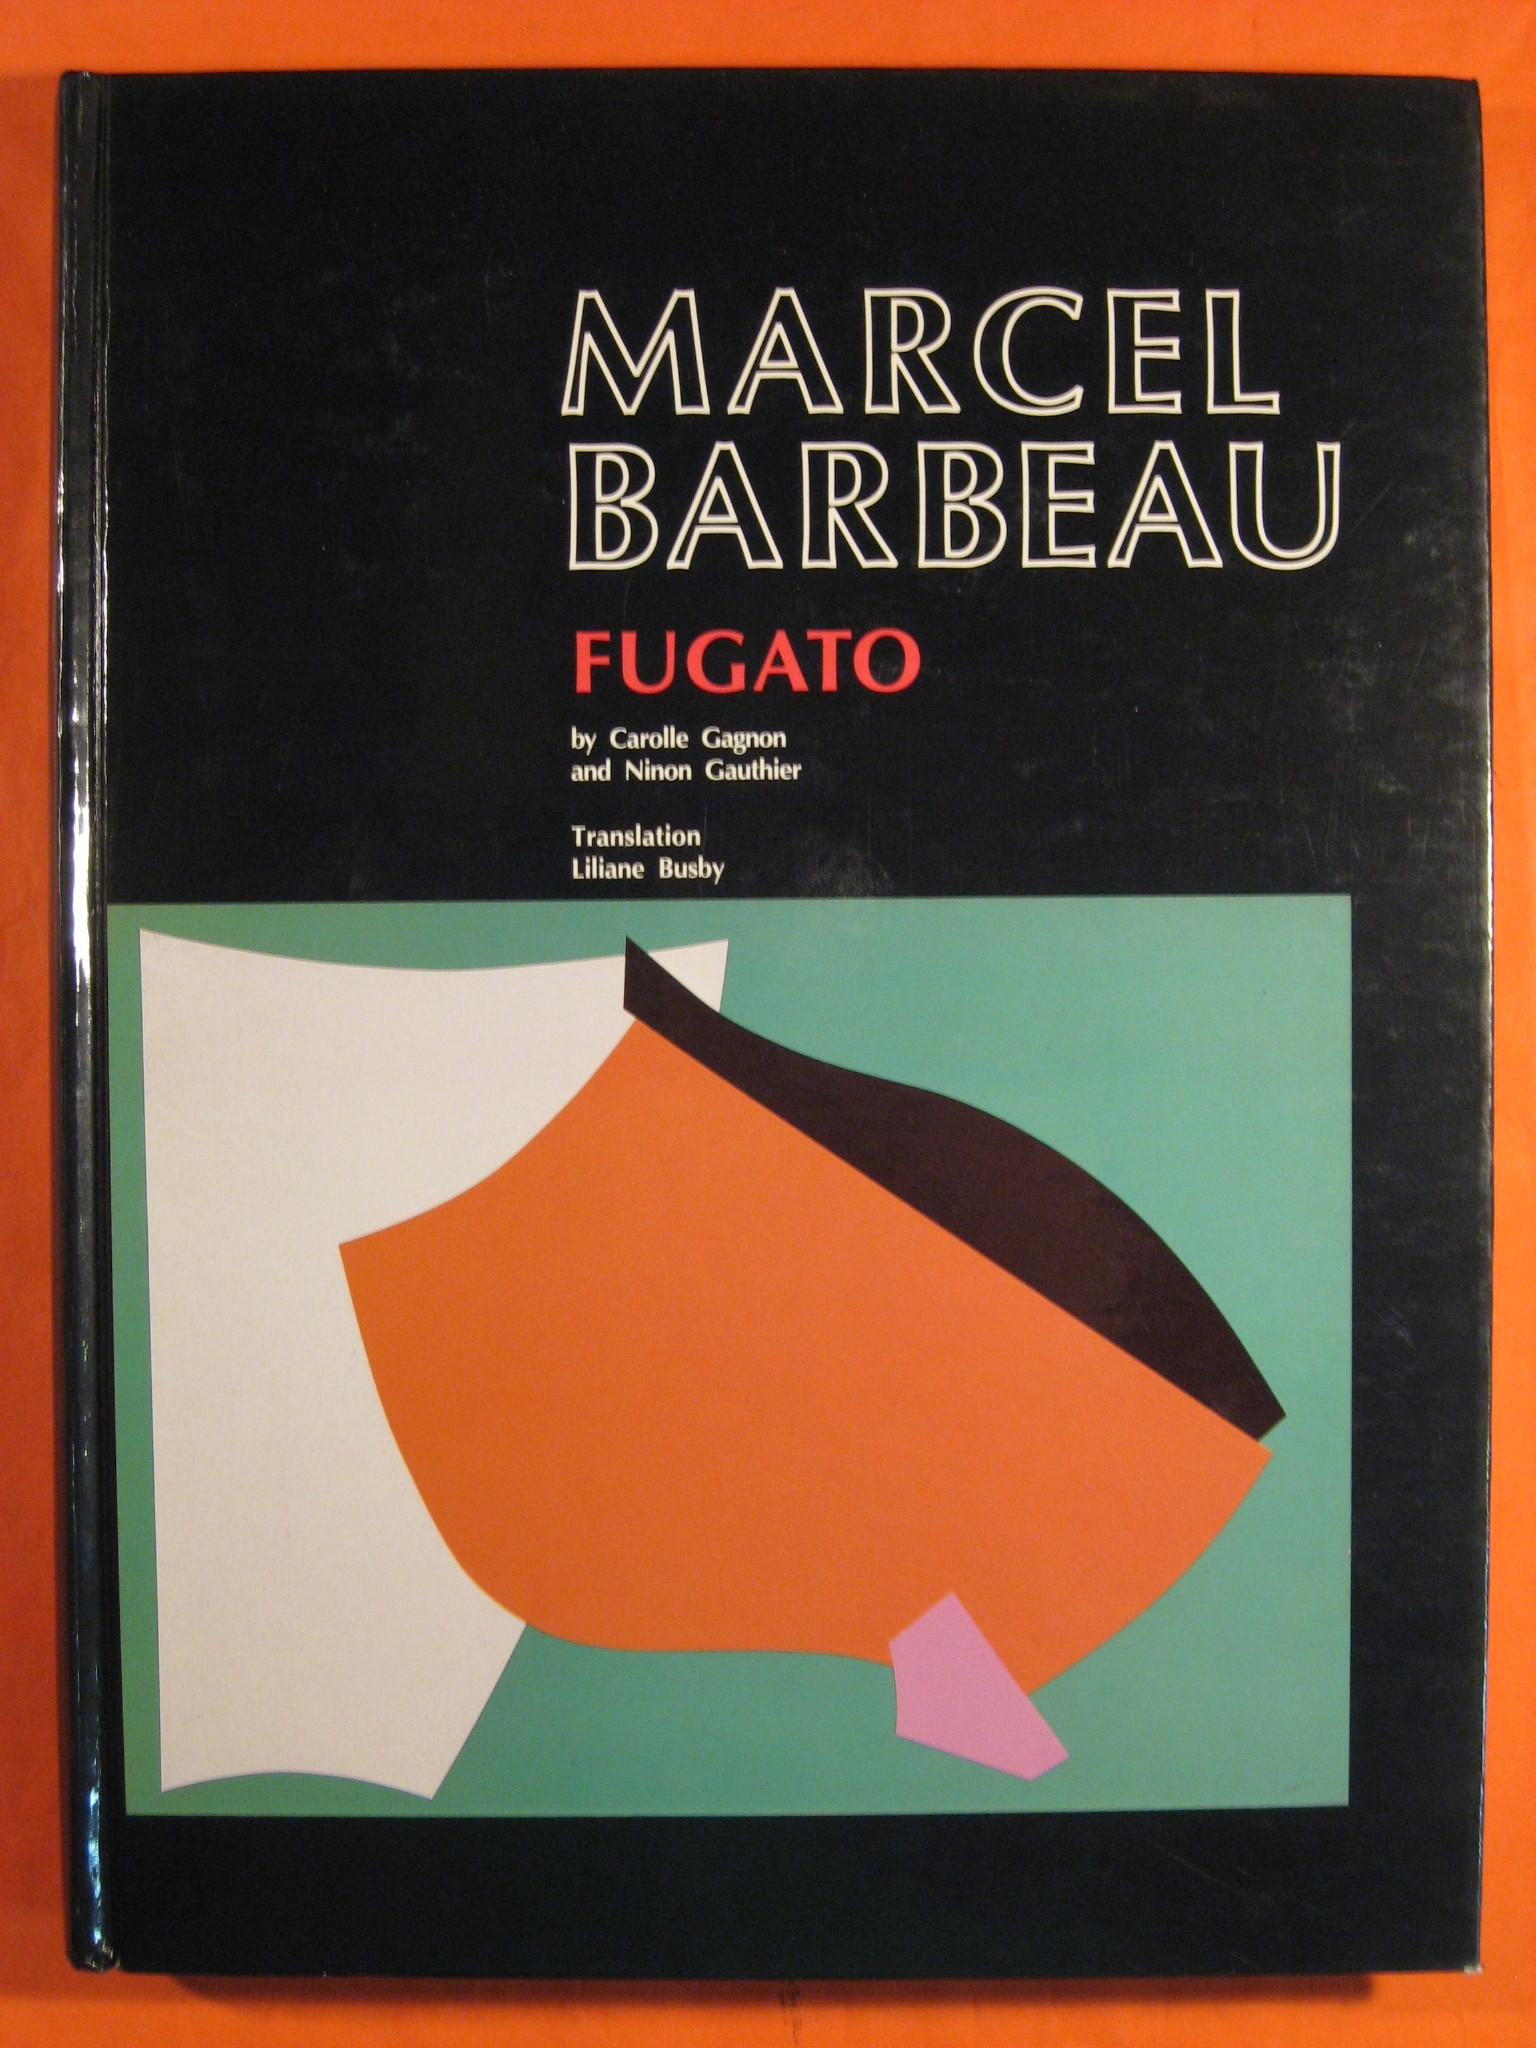 Marcel Barbeau: Fugato, Gagon, Carolle; Gauthier, Ninon; Marcel Barbeau